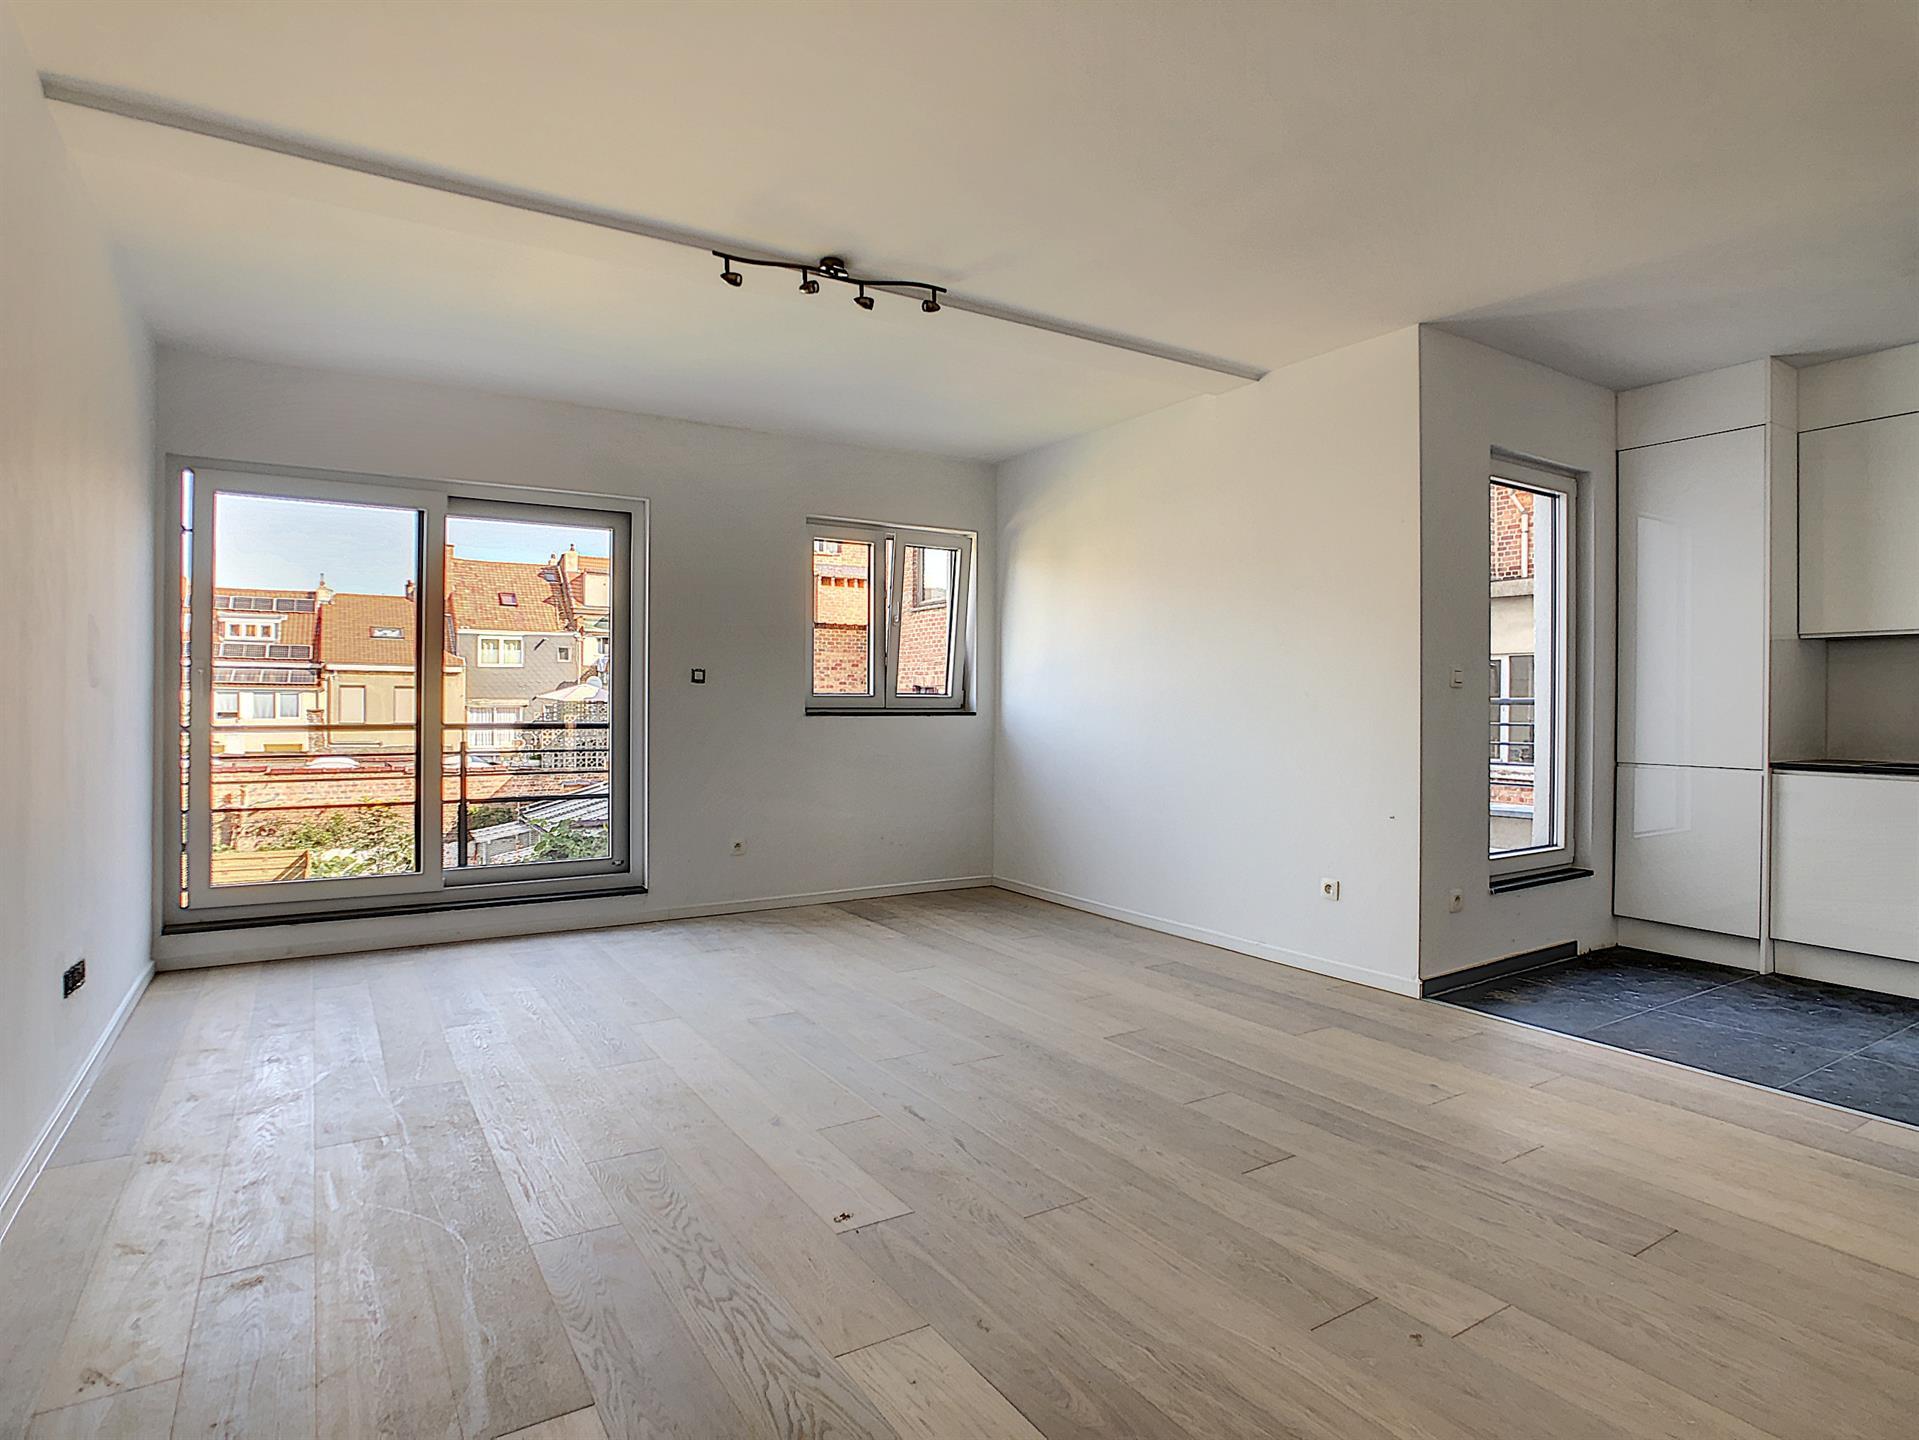 Appartement - Anderlecht - #4252385-4